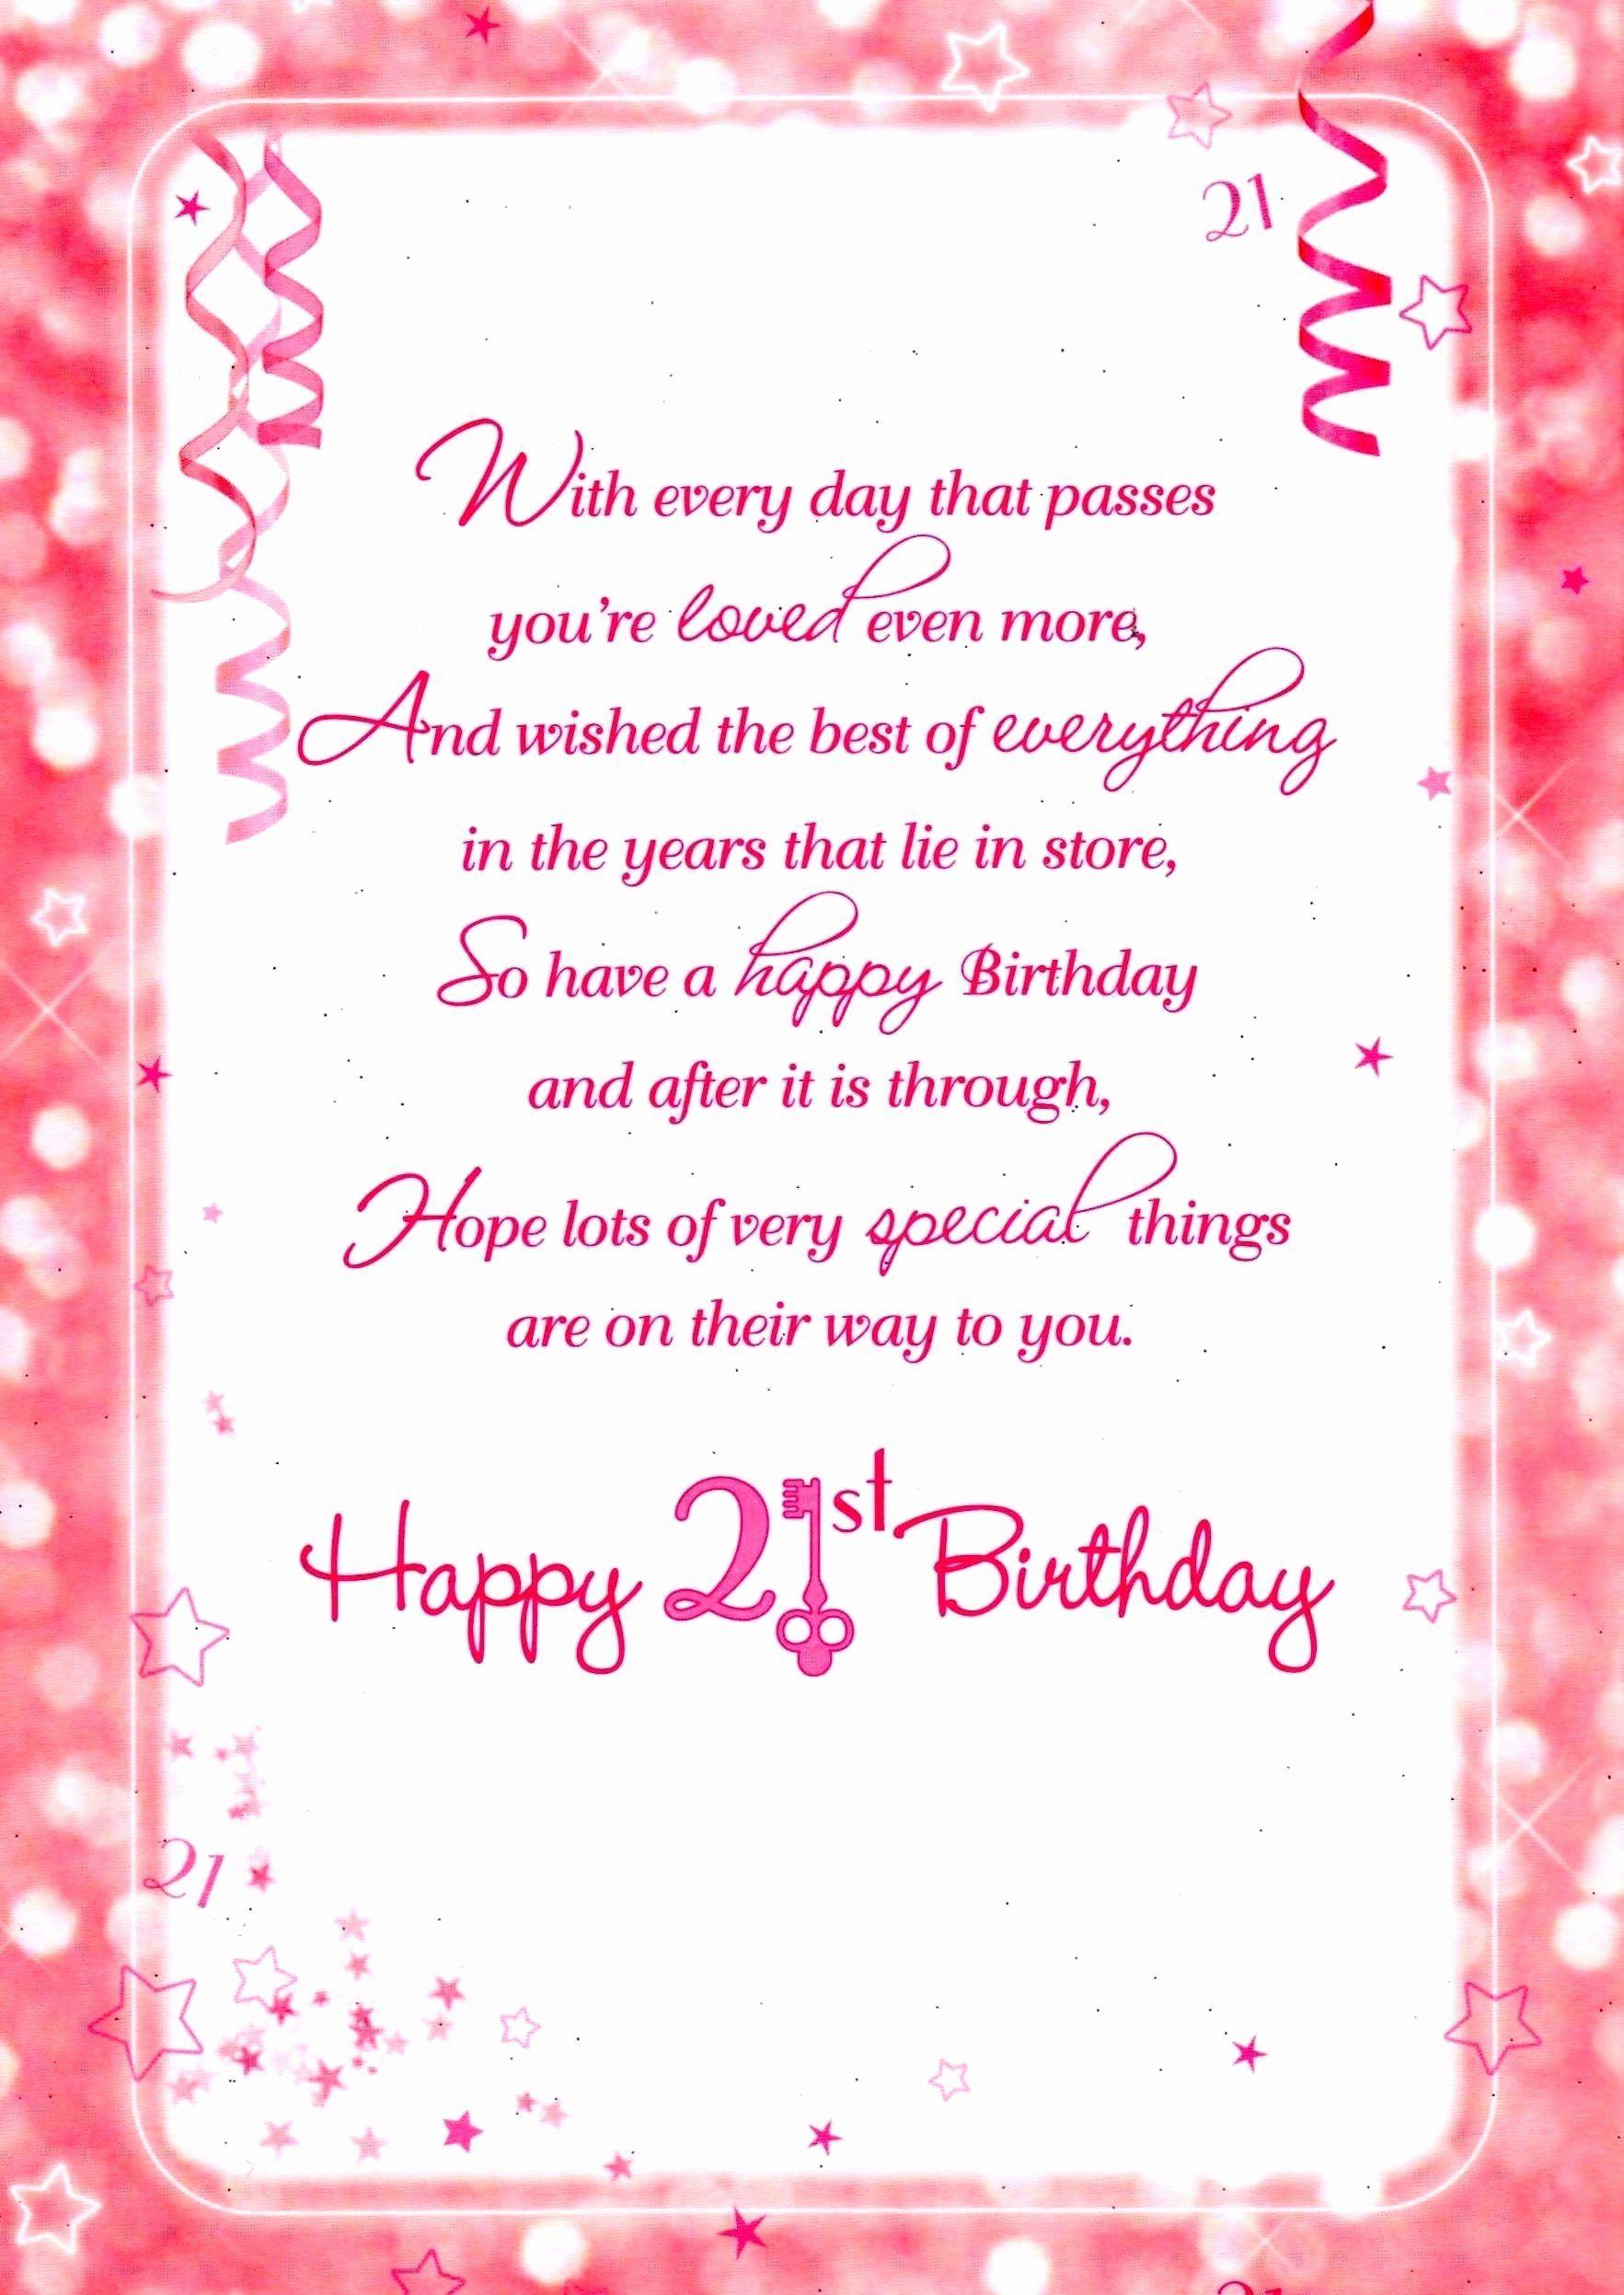 21 Birthday Card Elegant 95 21st Birthday Greetings Cards 21st Birthday Card Daughter 21st Birthday Wishes Happy 21st Birthday Wishes 21st Birthday Cards